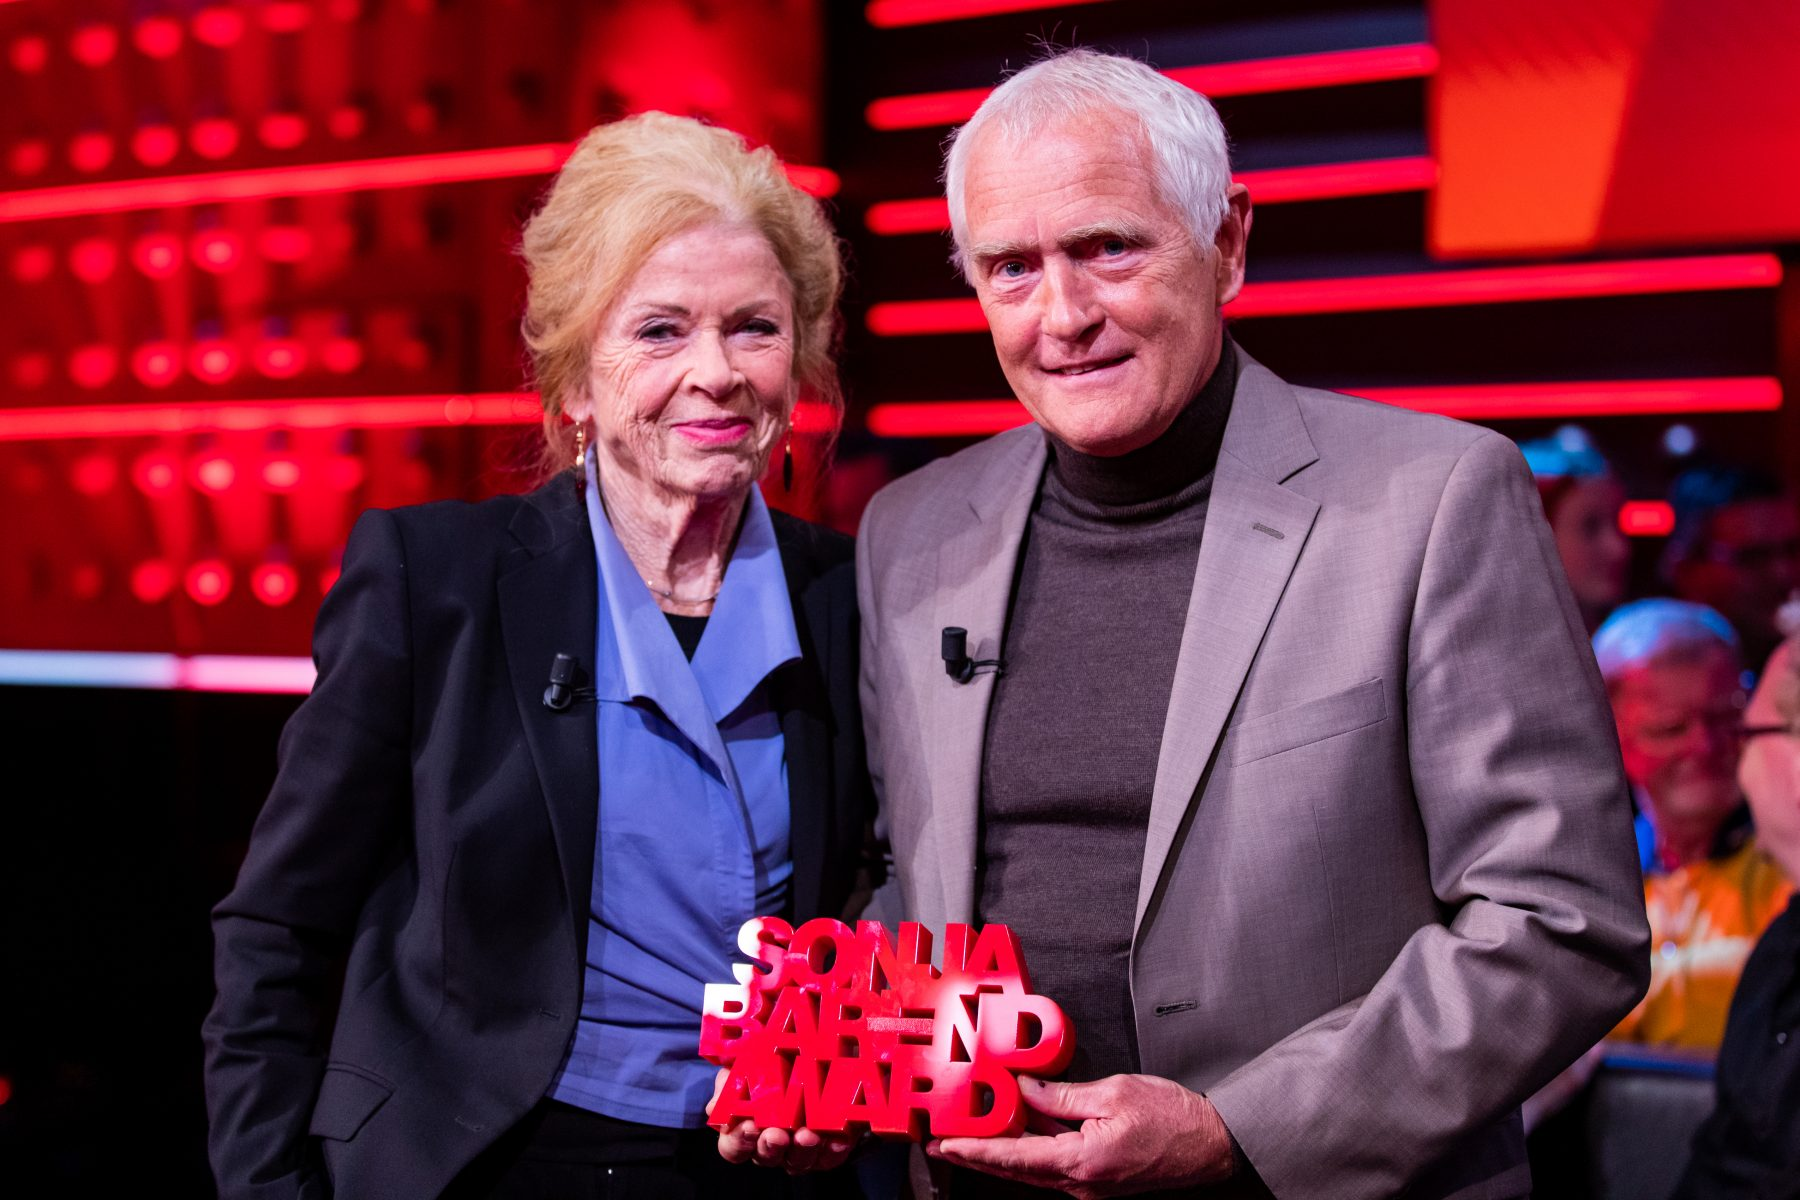 Sonja Barend Award Kefah Allush